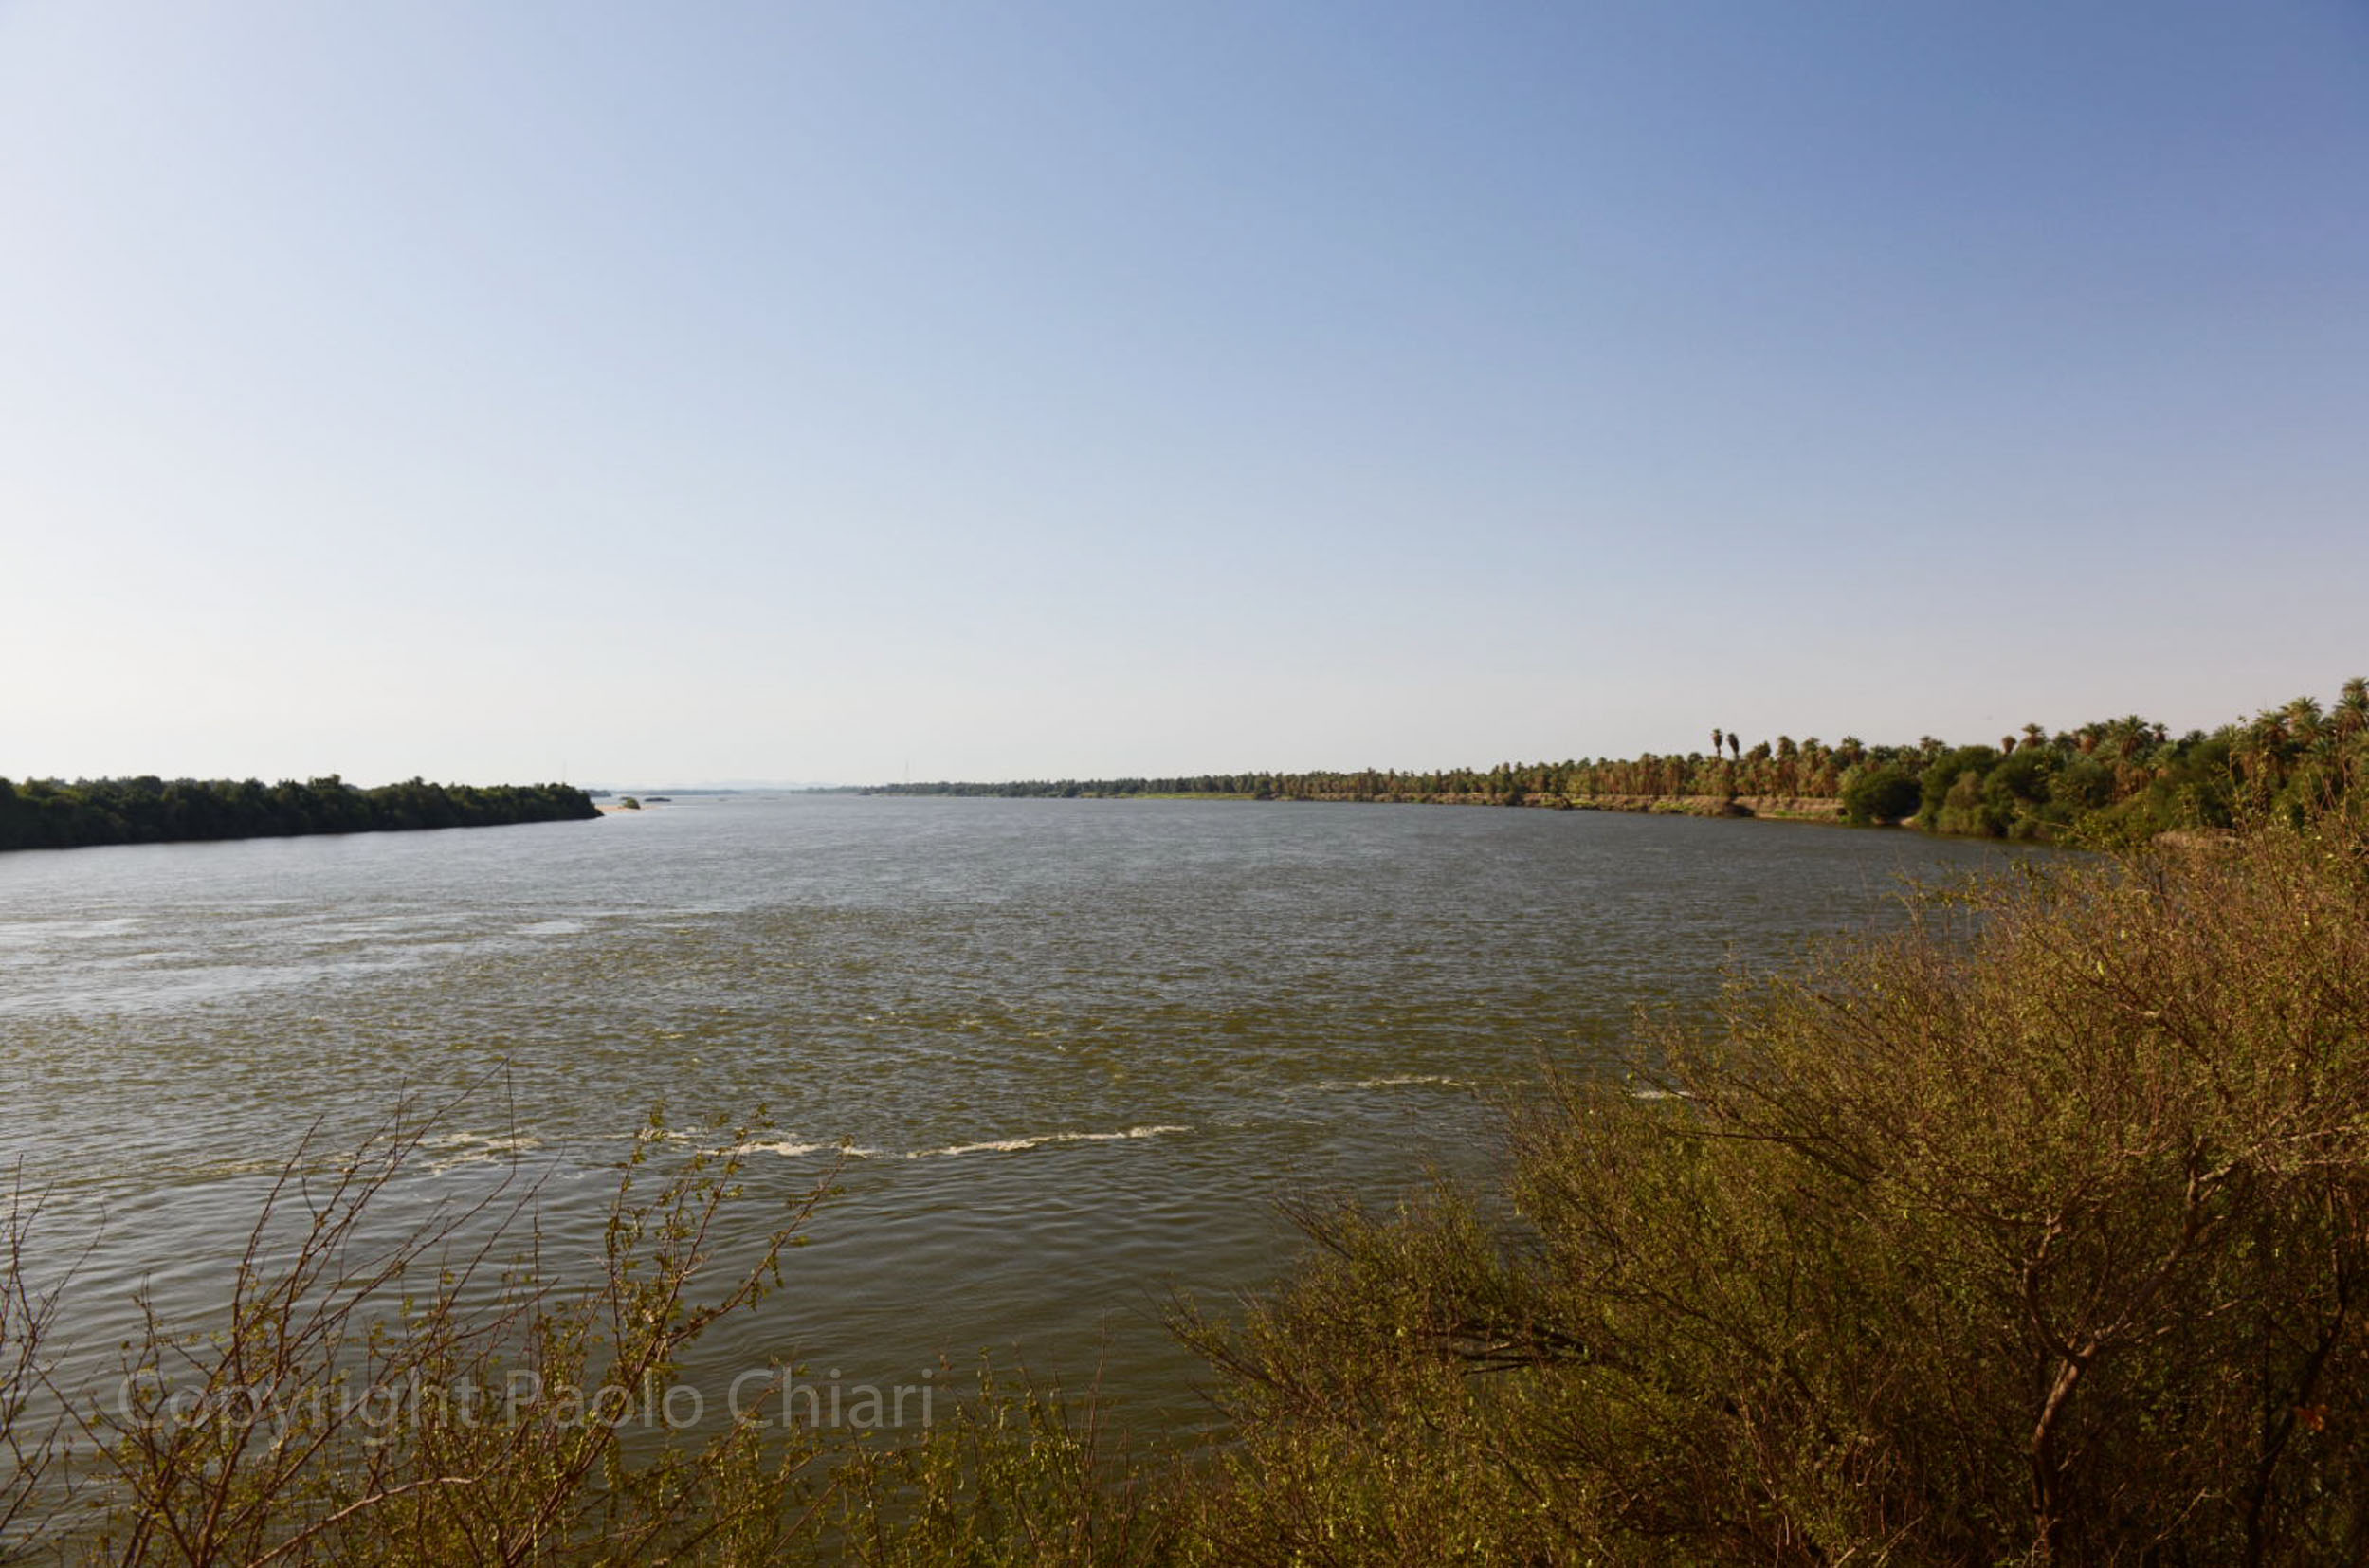 Sudan2013_0617